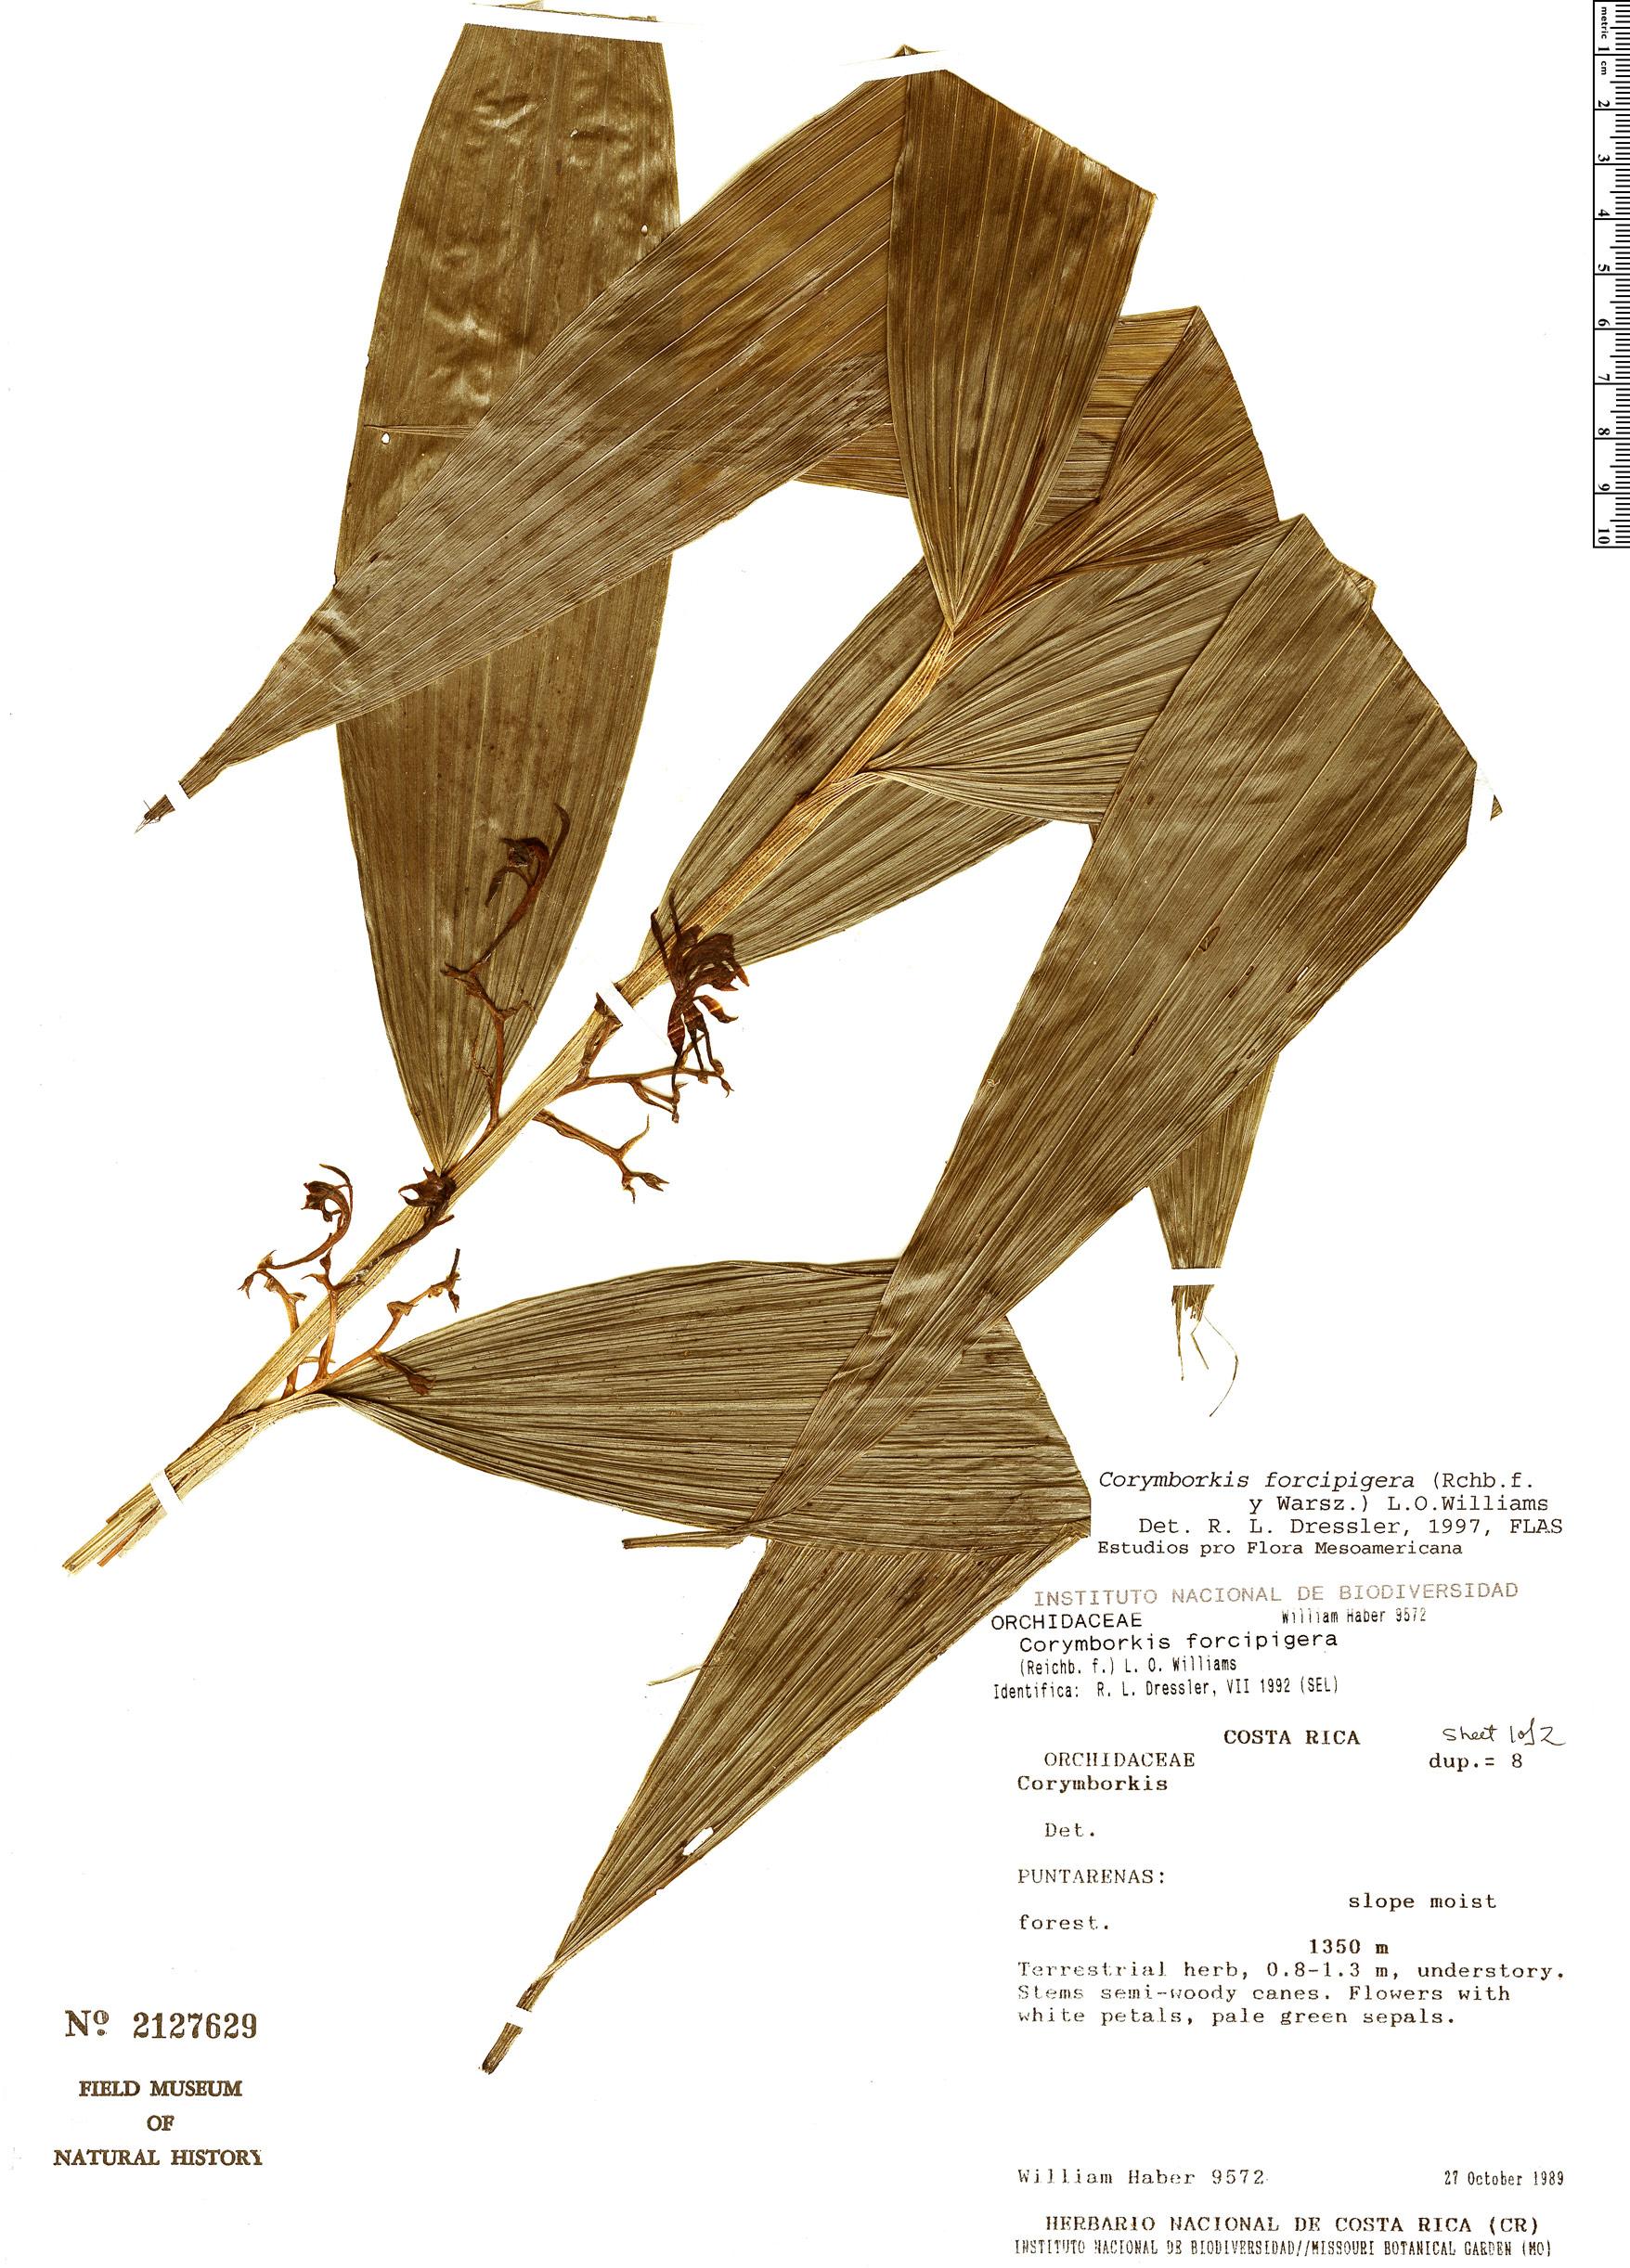 Specimen: Corymborkis forcipigera